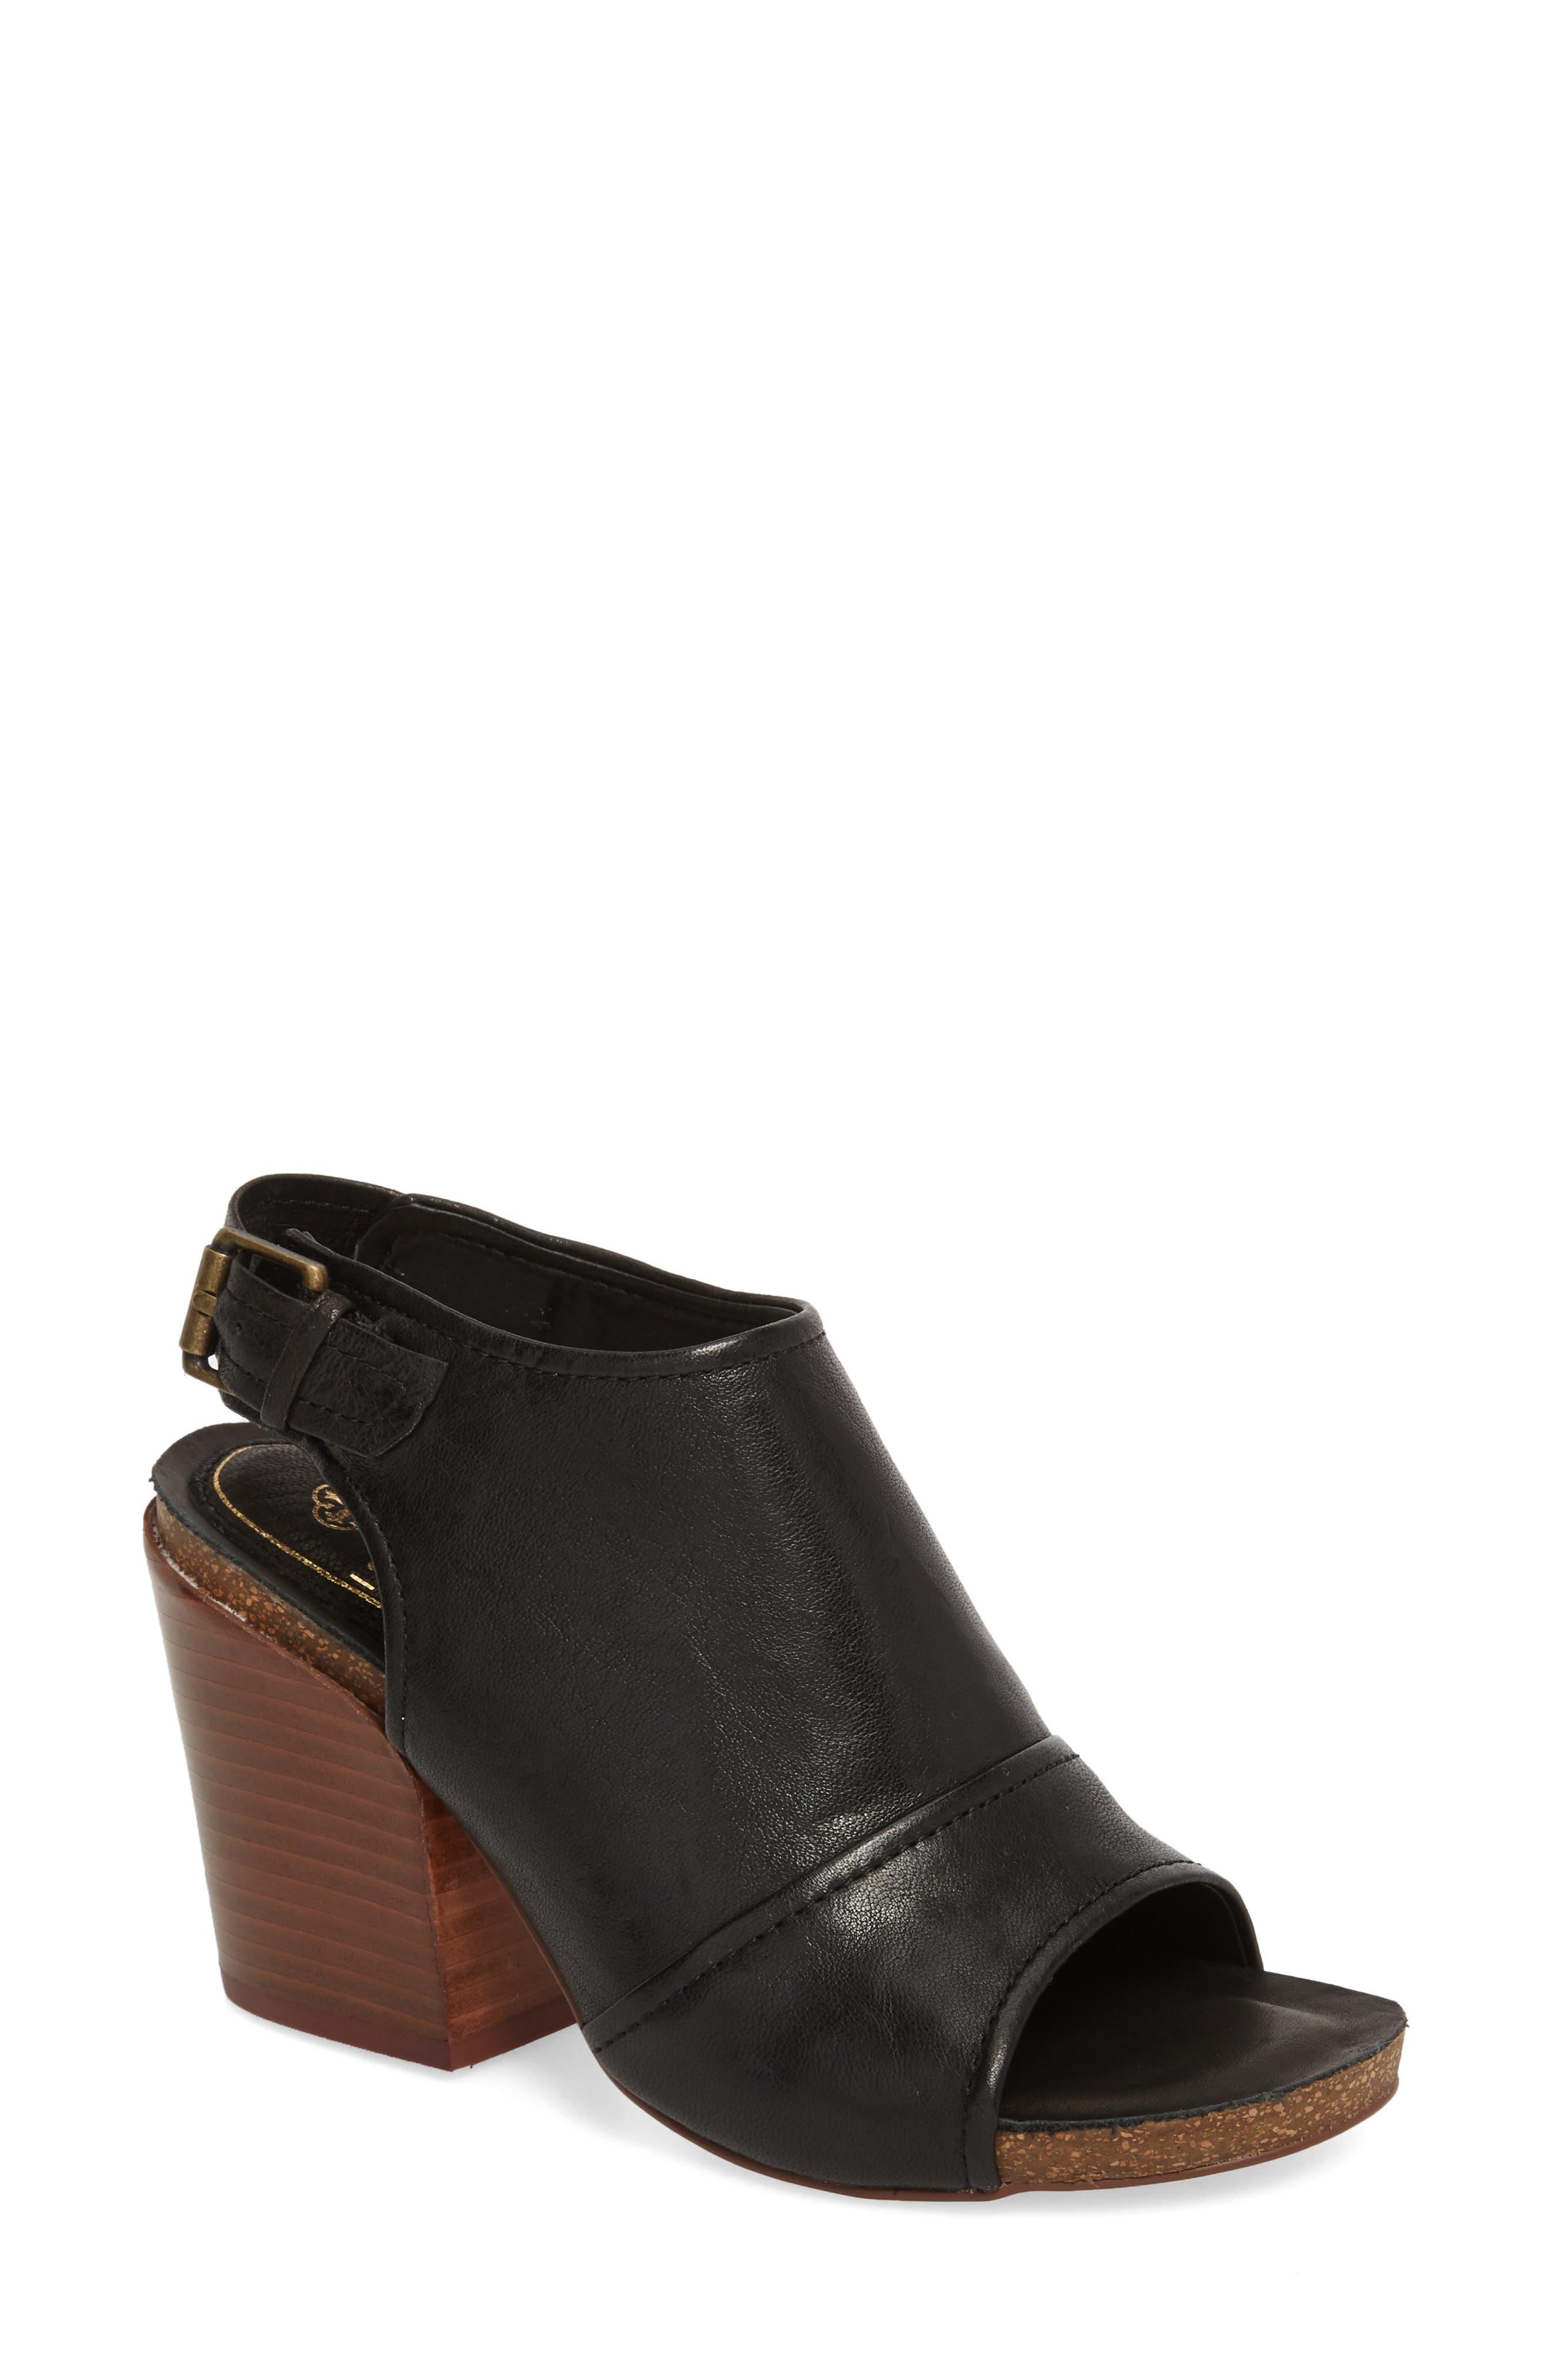 Isanti Slingback Sandal, Main, color, BLACK LEATHER